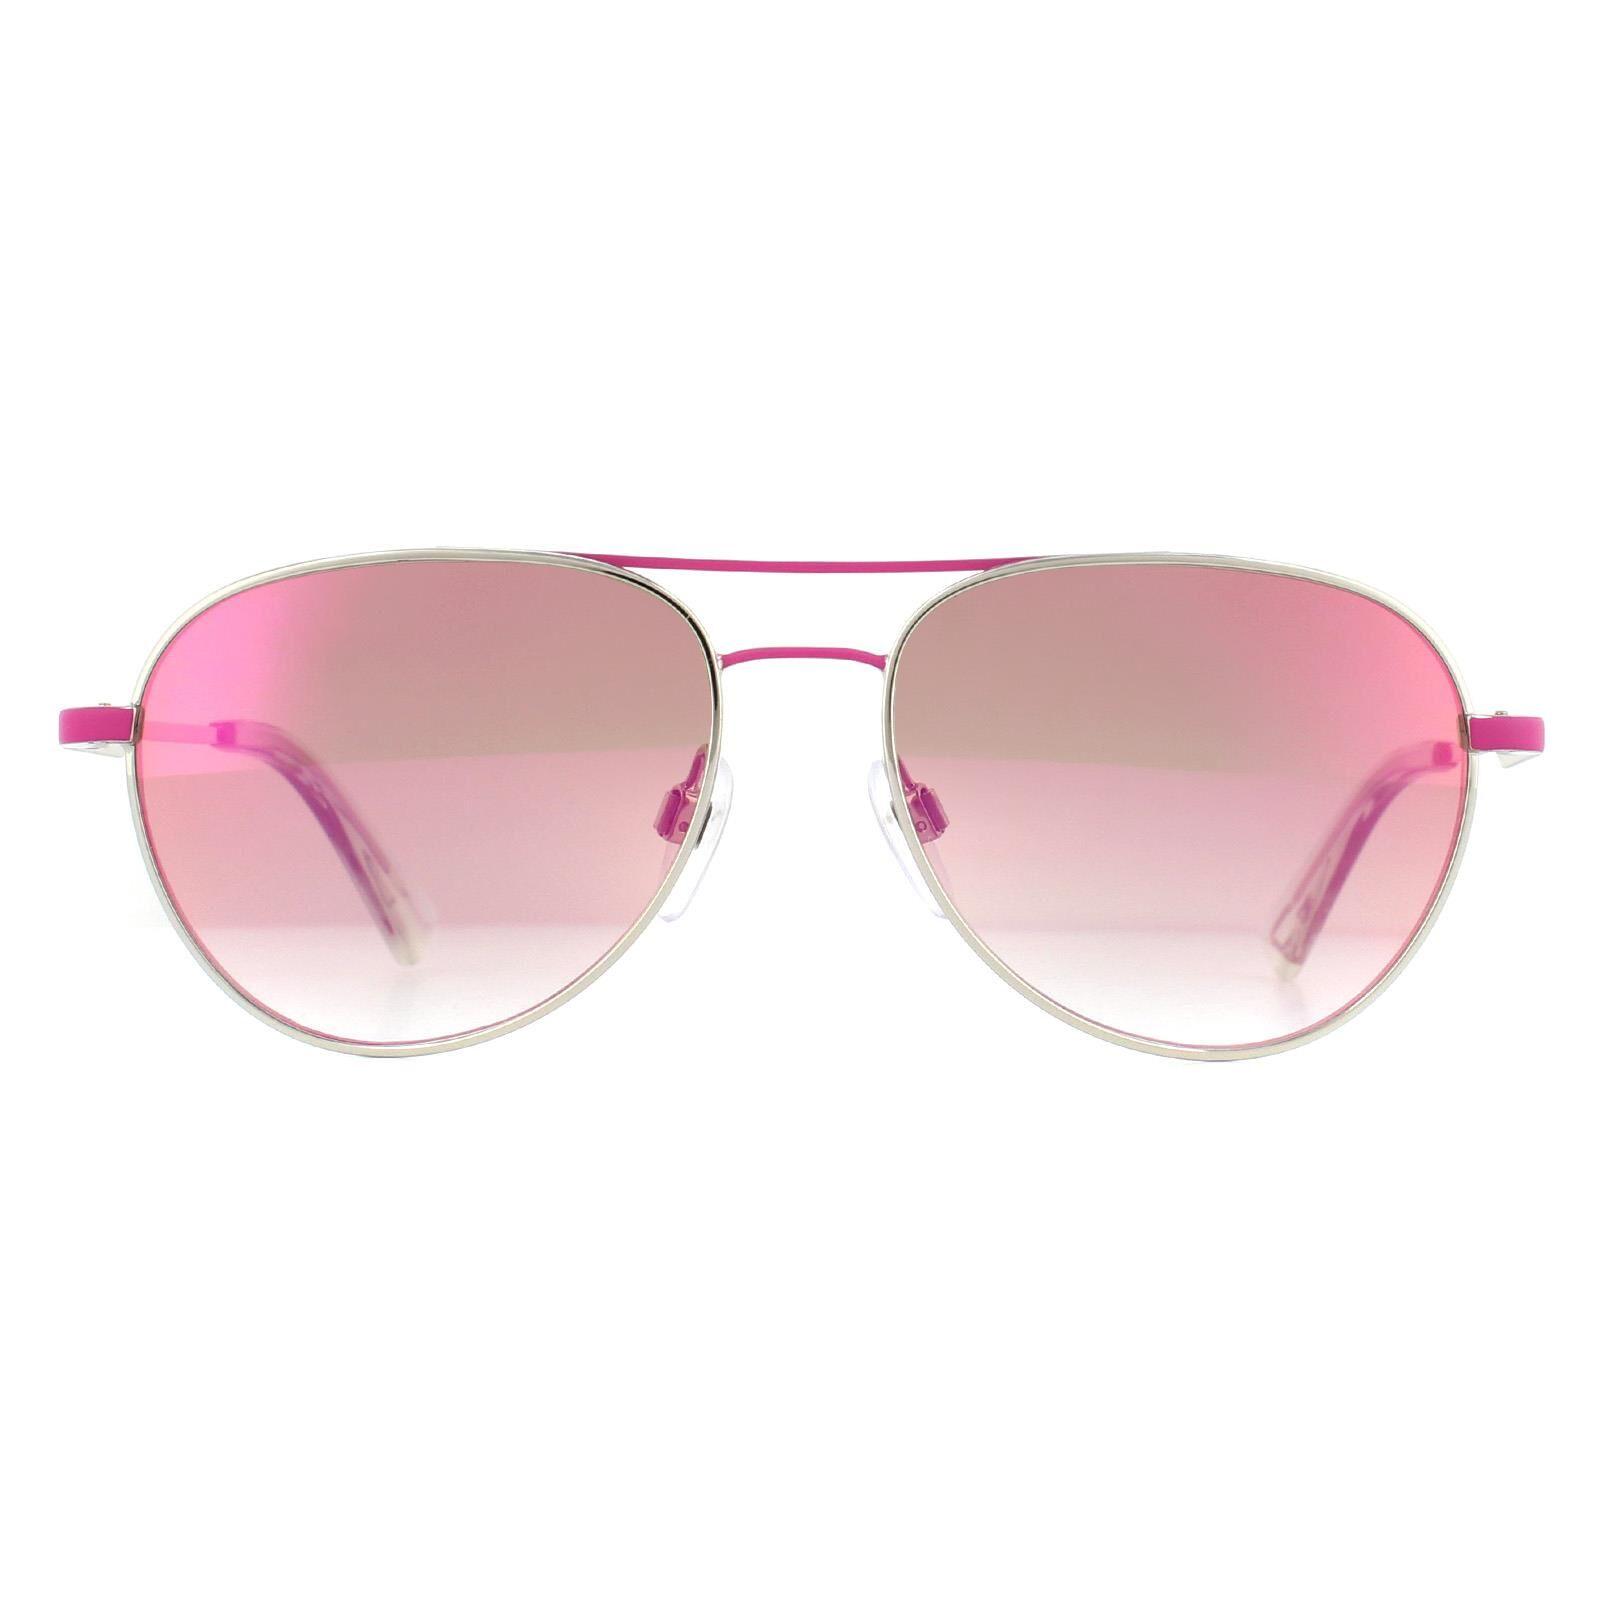 Diesel Sunglasses DL0291 77U Silver Fuschia Bordeaux Mirror